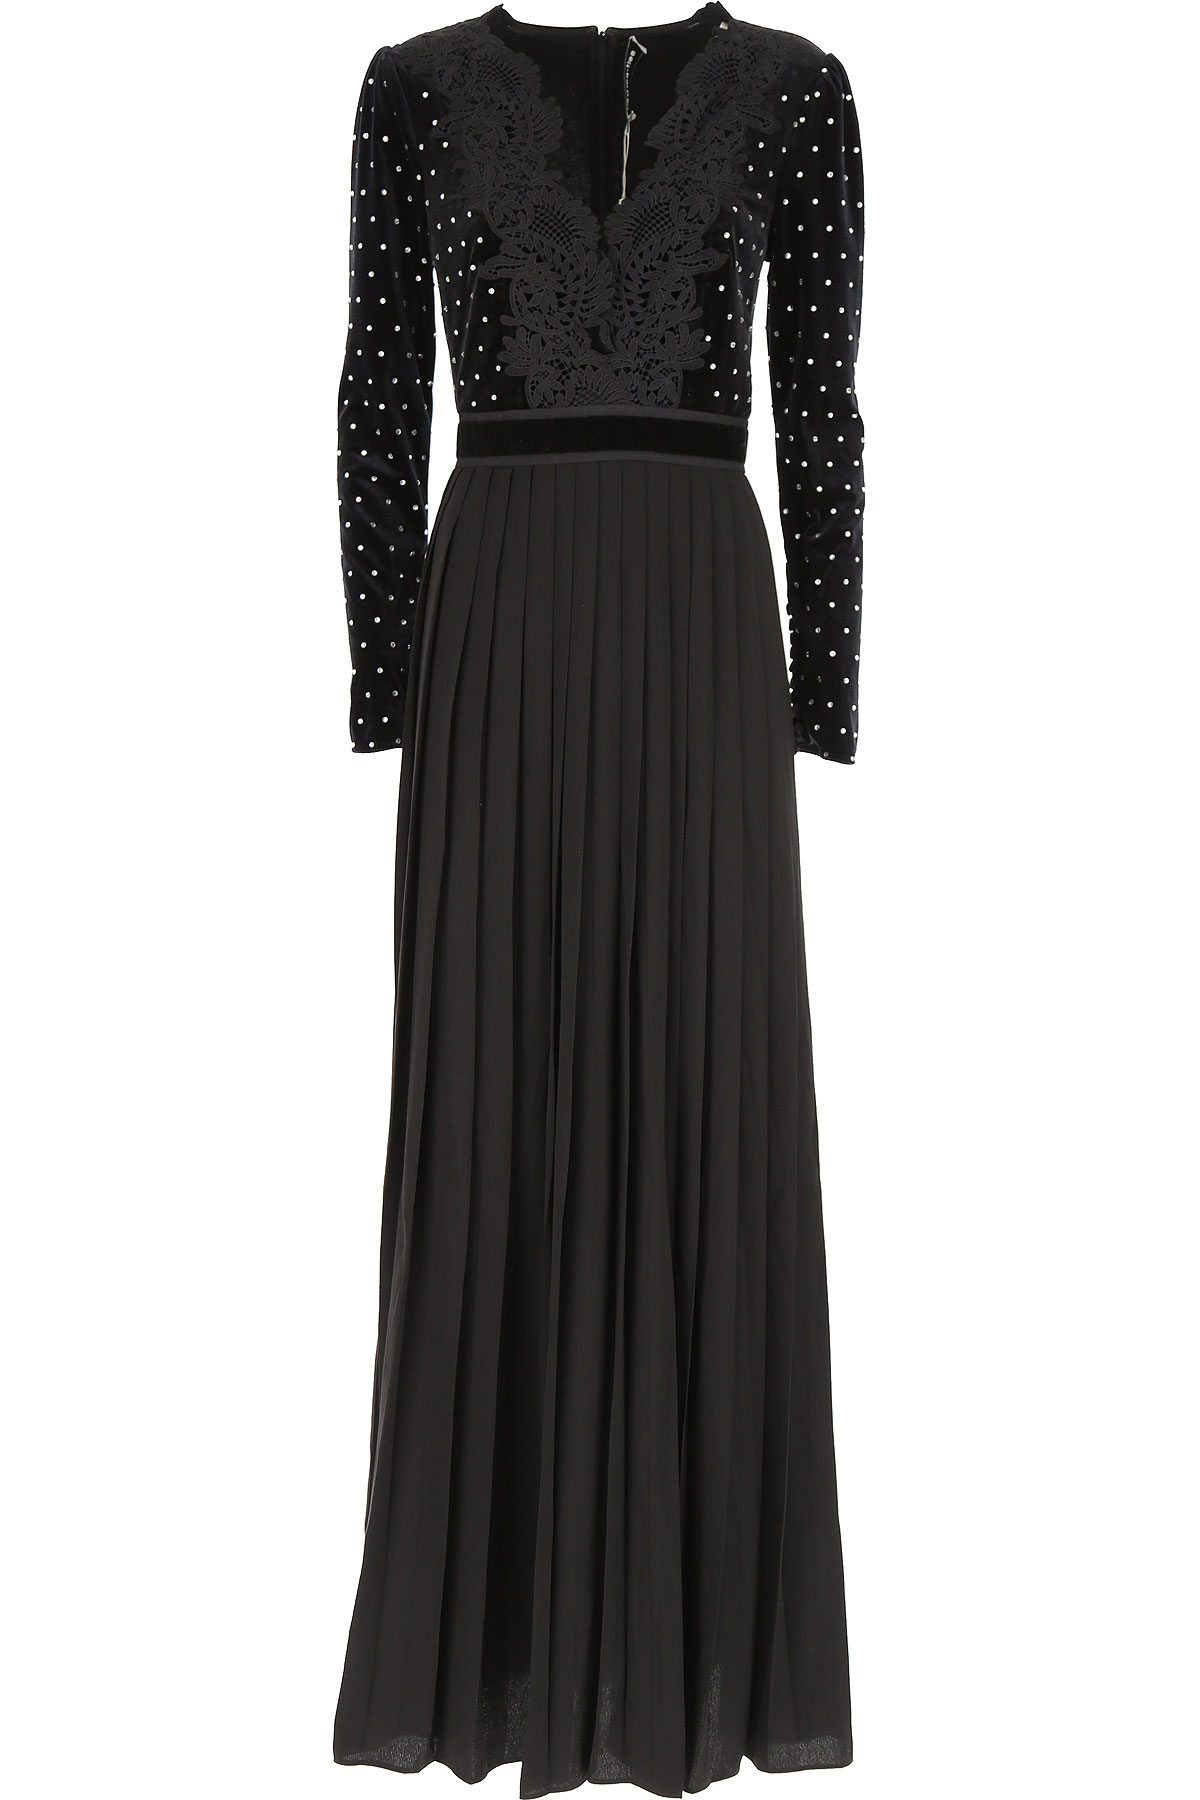 Self-portrait Dress for Women, Evening Cocktail Party, Black, polyester, 2017, UK 8 - US 6 - EU 40 UK 10 - US 8 - EU 42